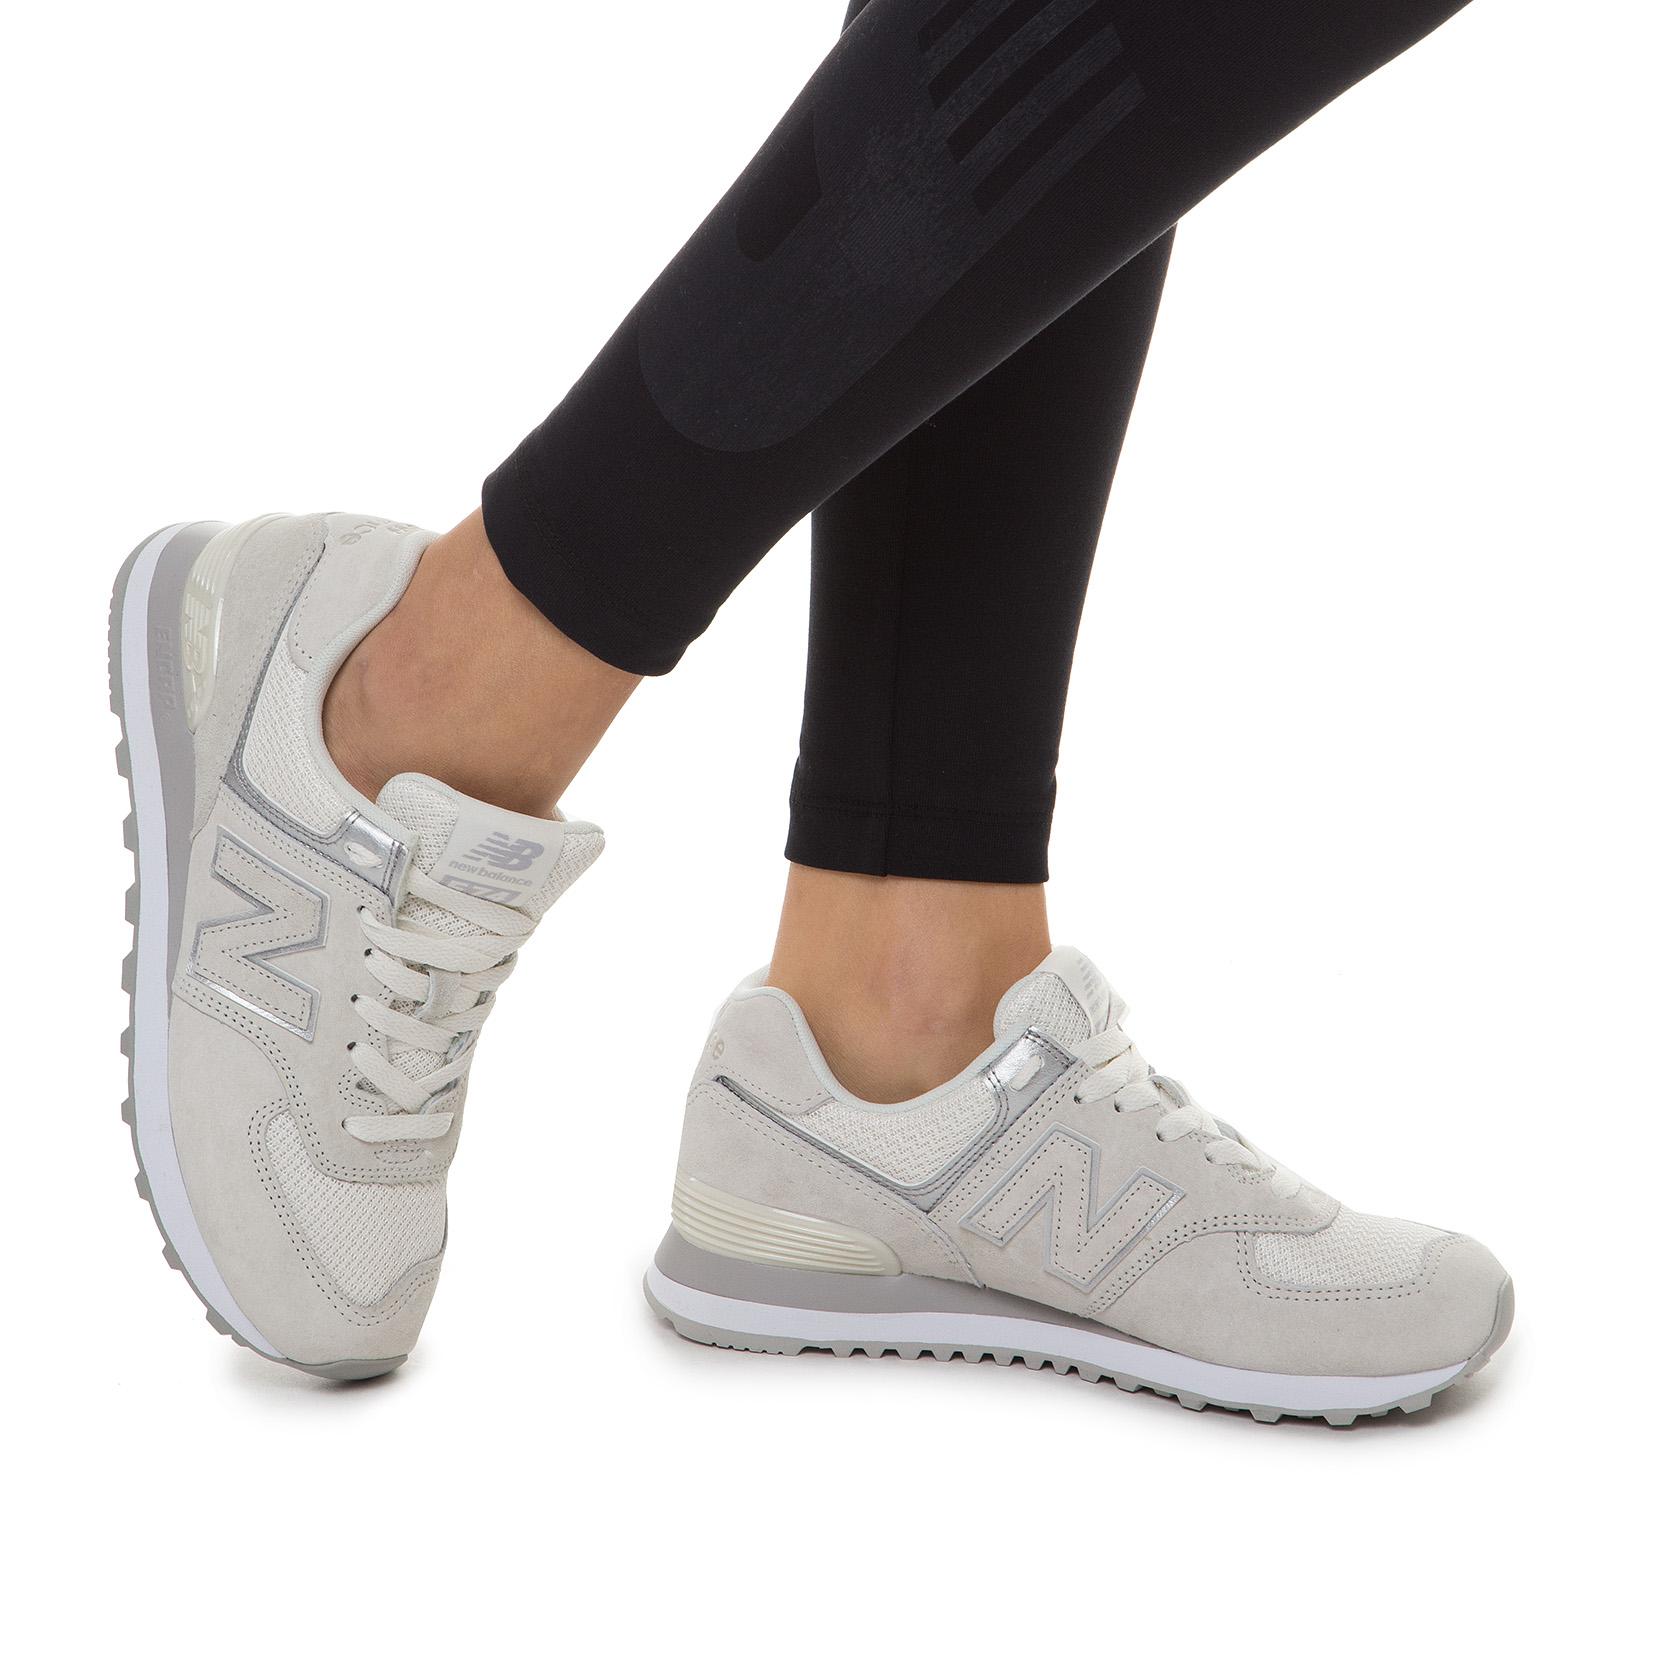 Жіноче взуття повсякденне New Balance 574  WL574EX   New Balance